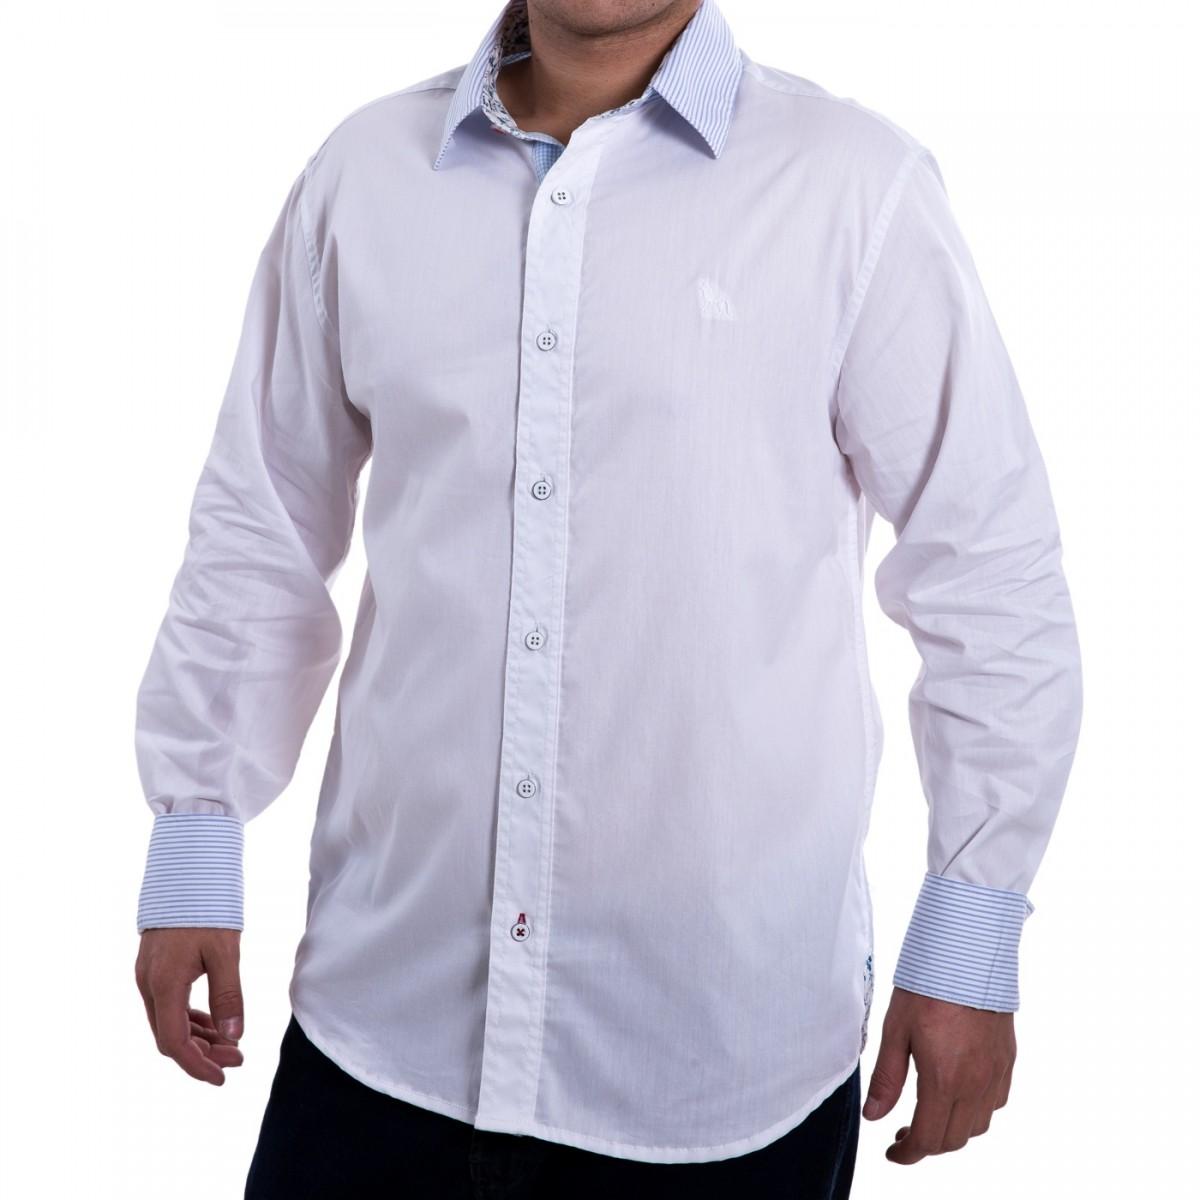 987417620c160 Bizz Store - Camisa Social Masculina Branca Manga Longa Acostamento